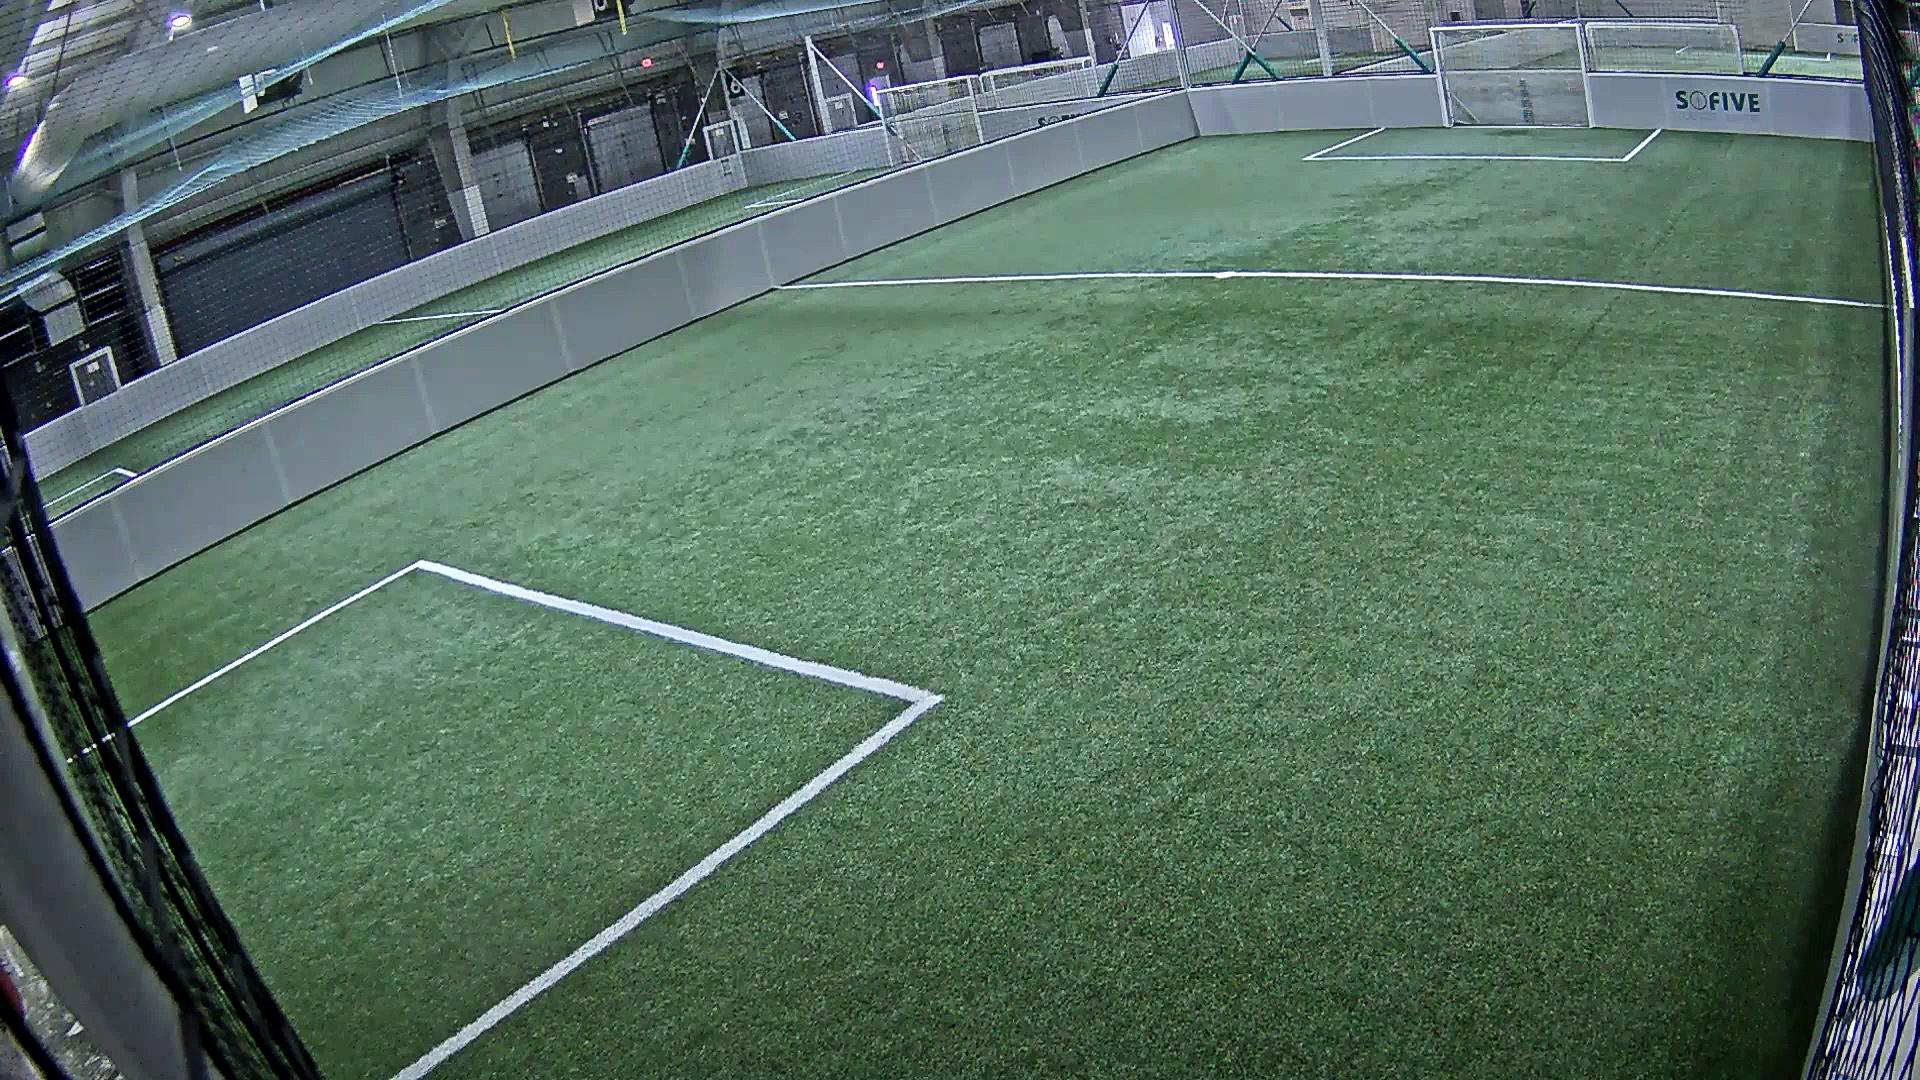 09/15/2019 13:00:01 - Sofive Soccer Centers Rockville - Anfield